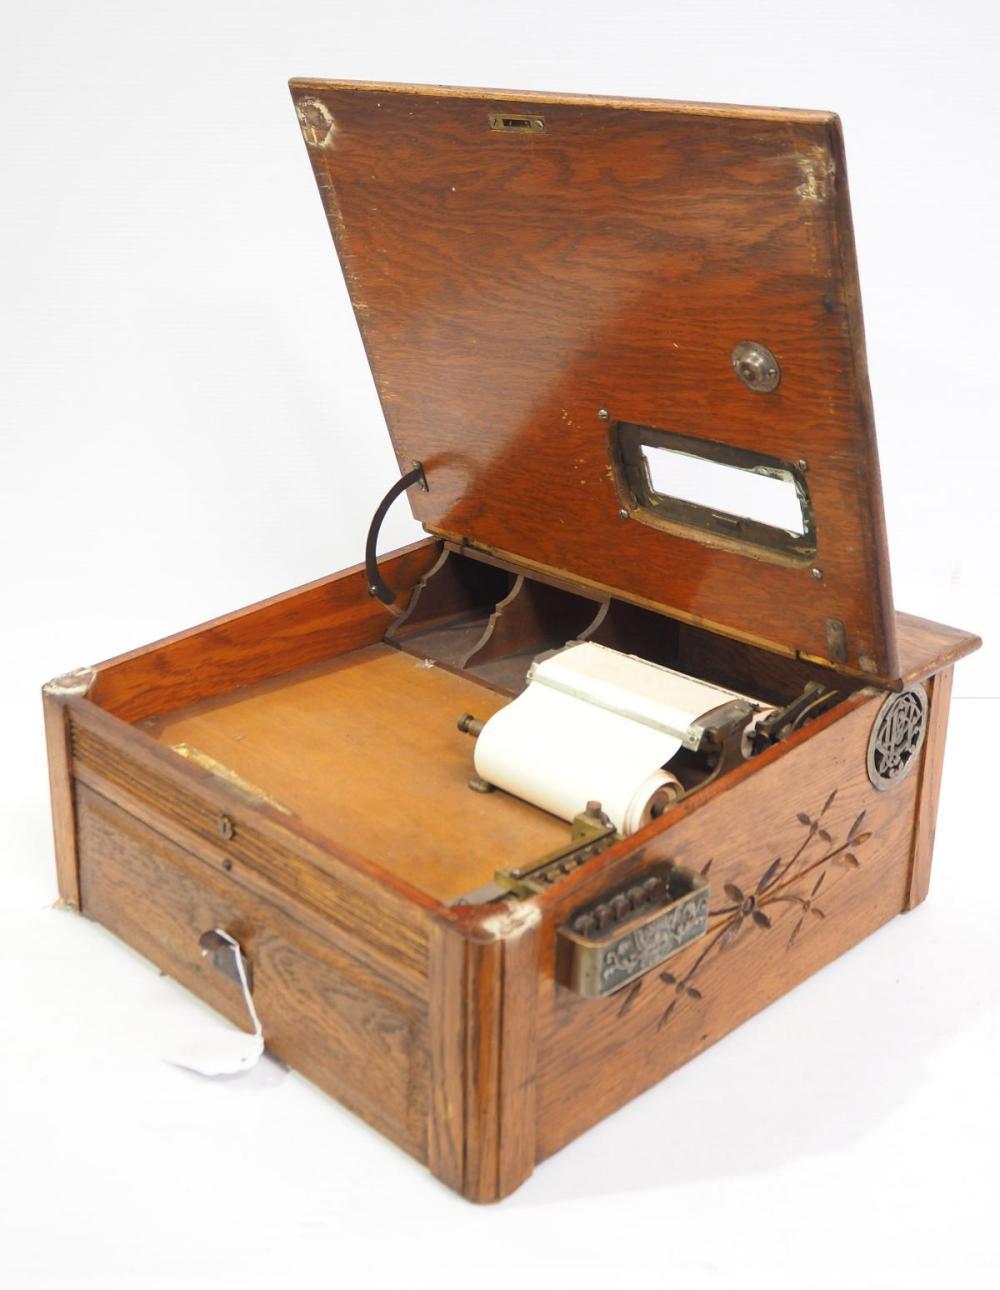 Pecks oak combination cash register